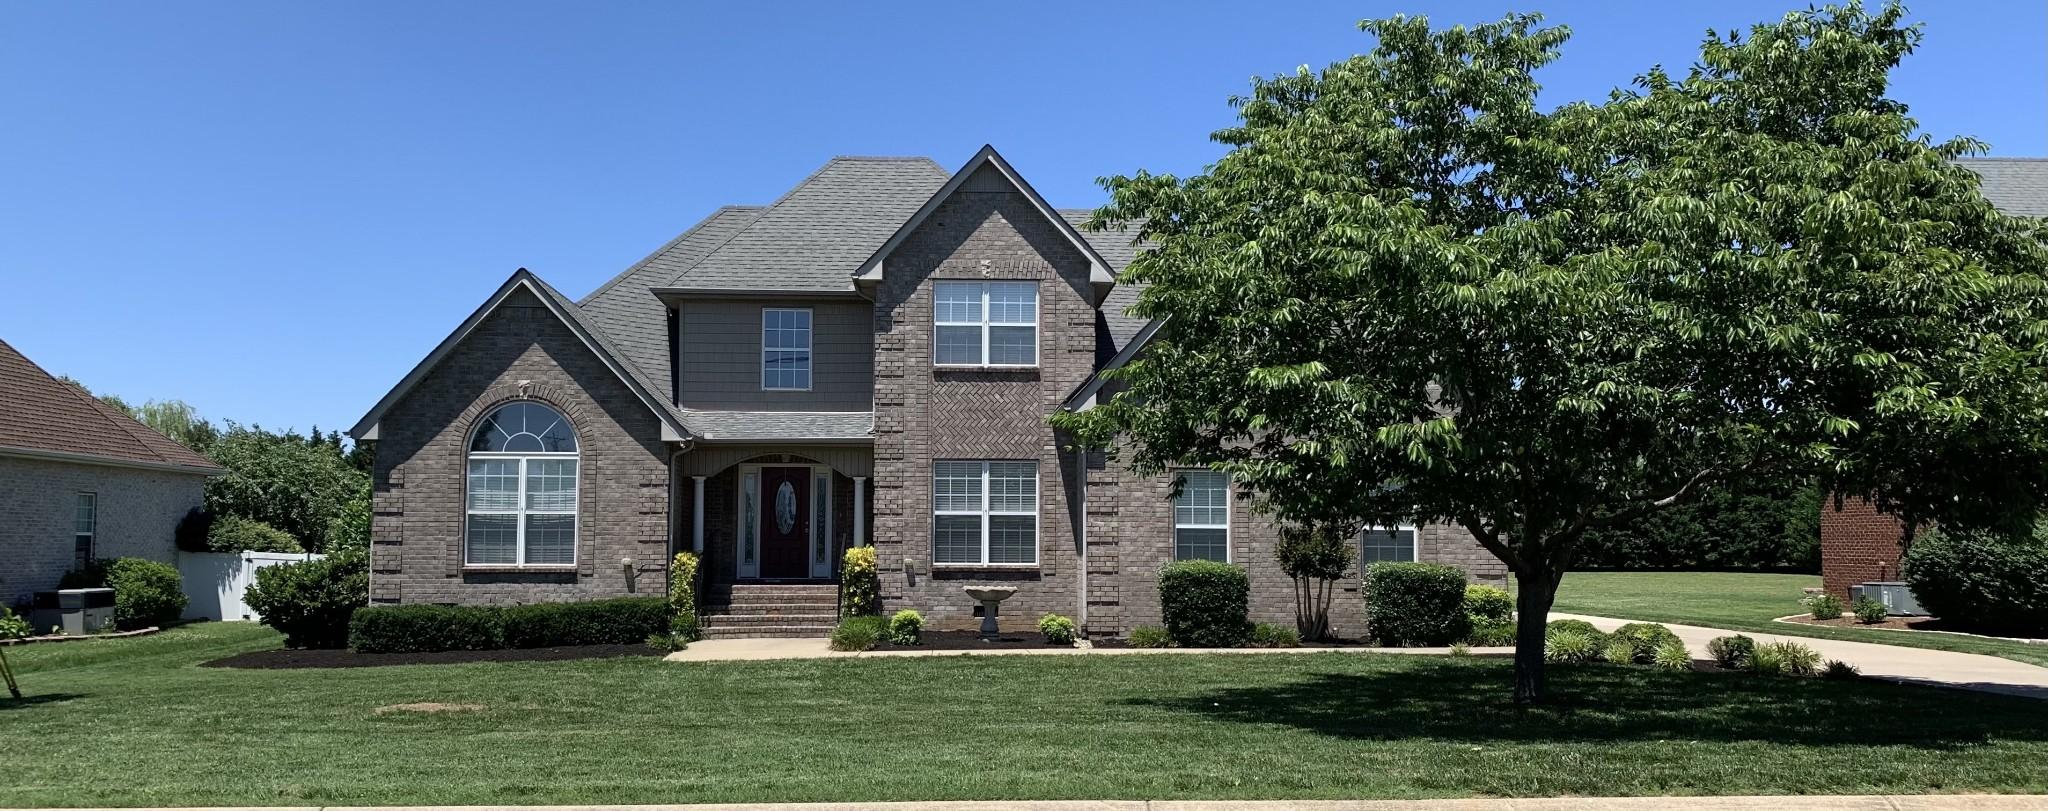 416 Beverly Randolph Dr Property Photo 1